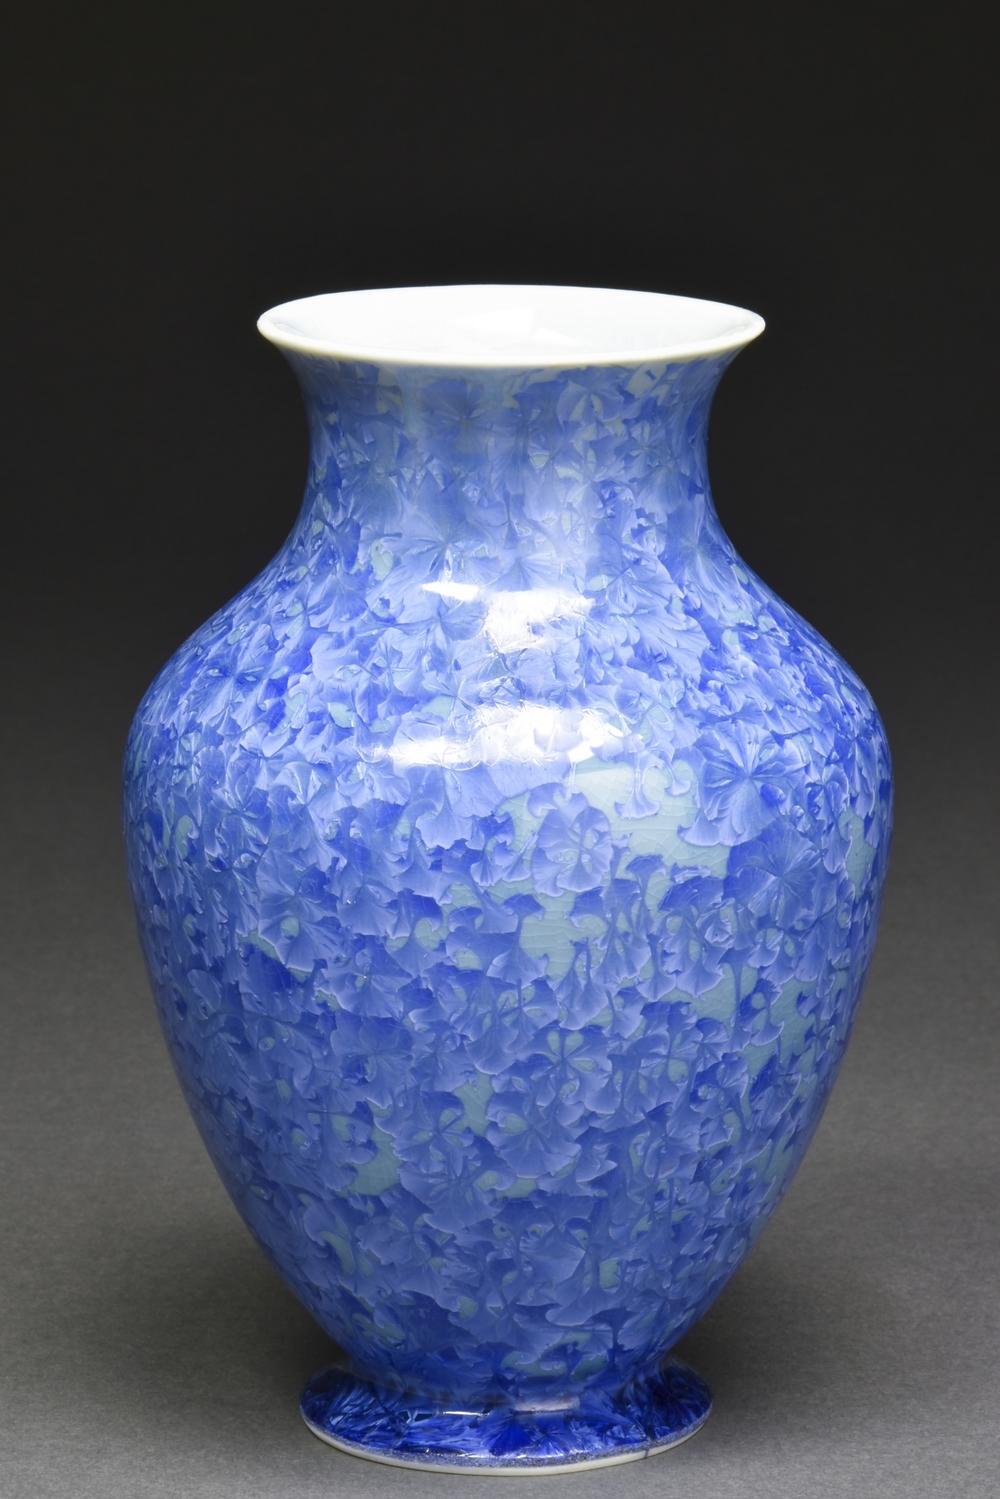 Crystalline Glazed Small Vase